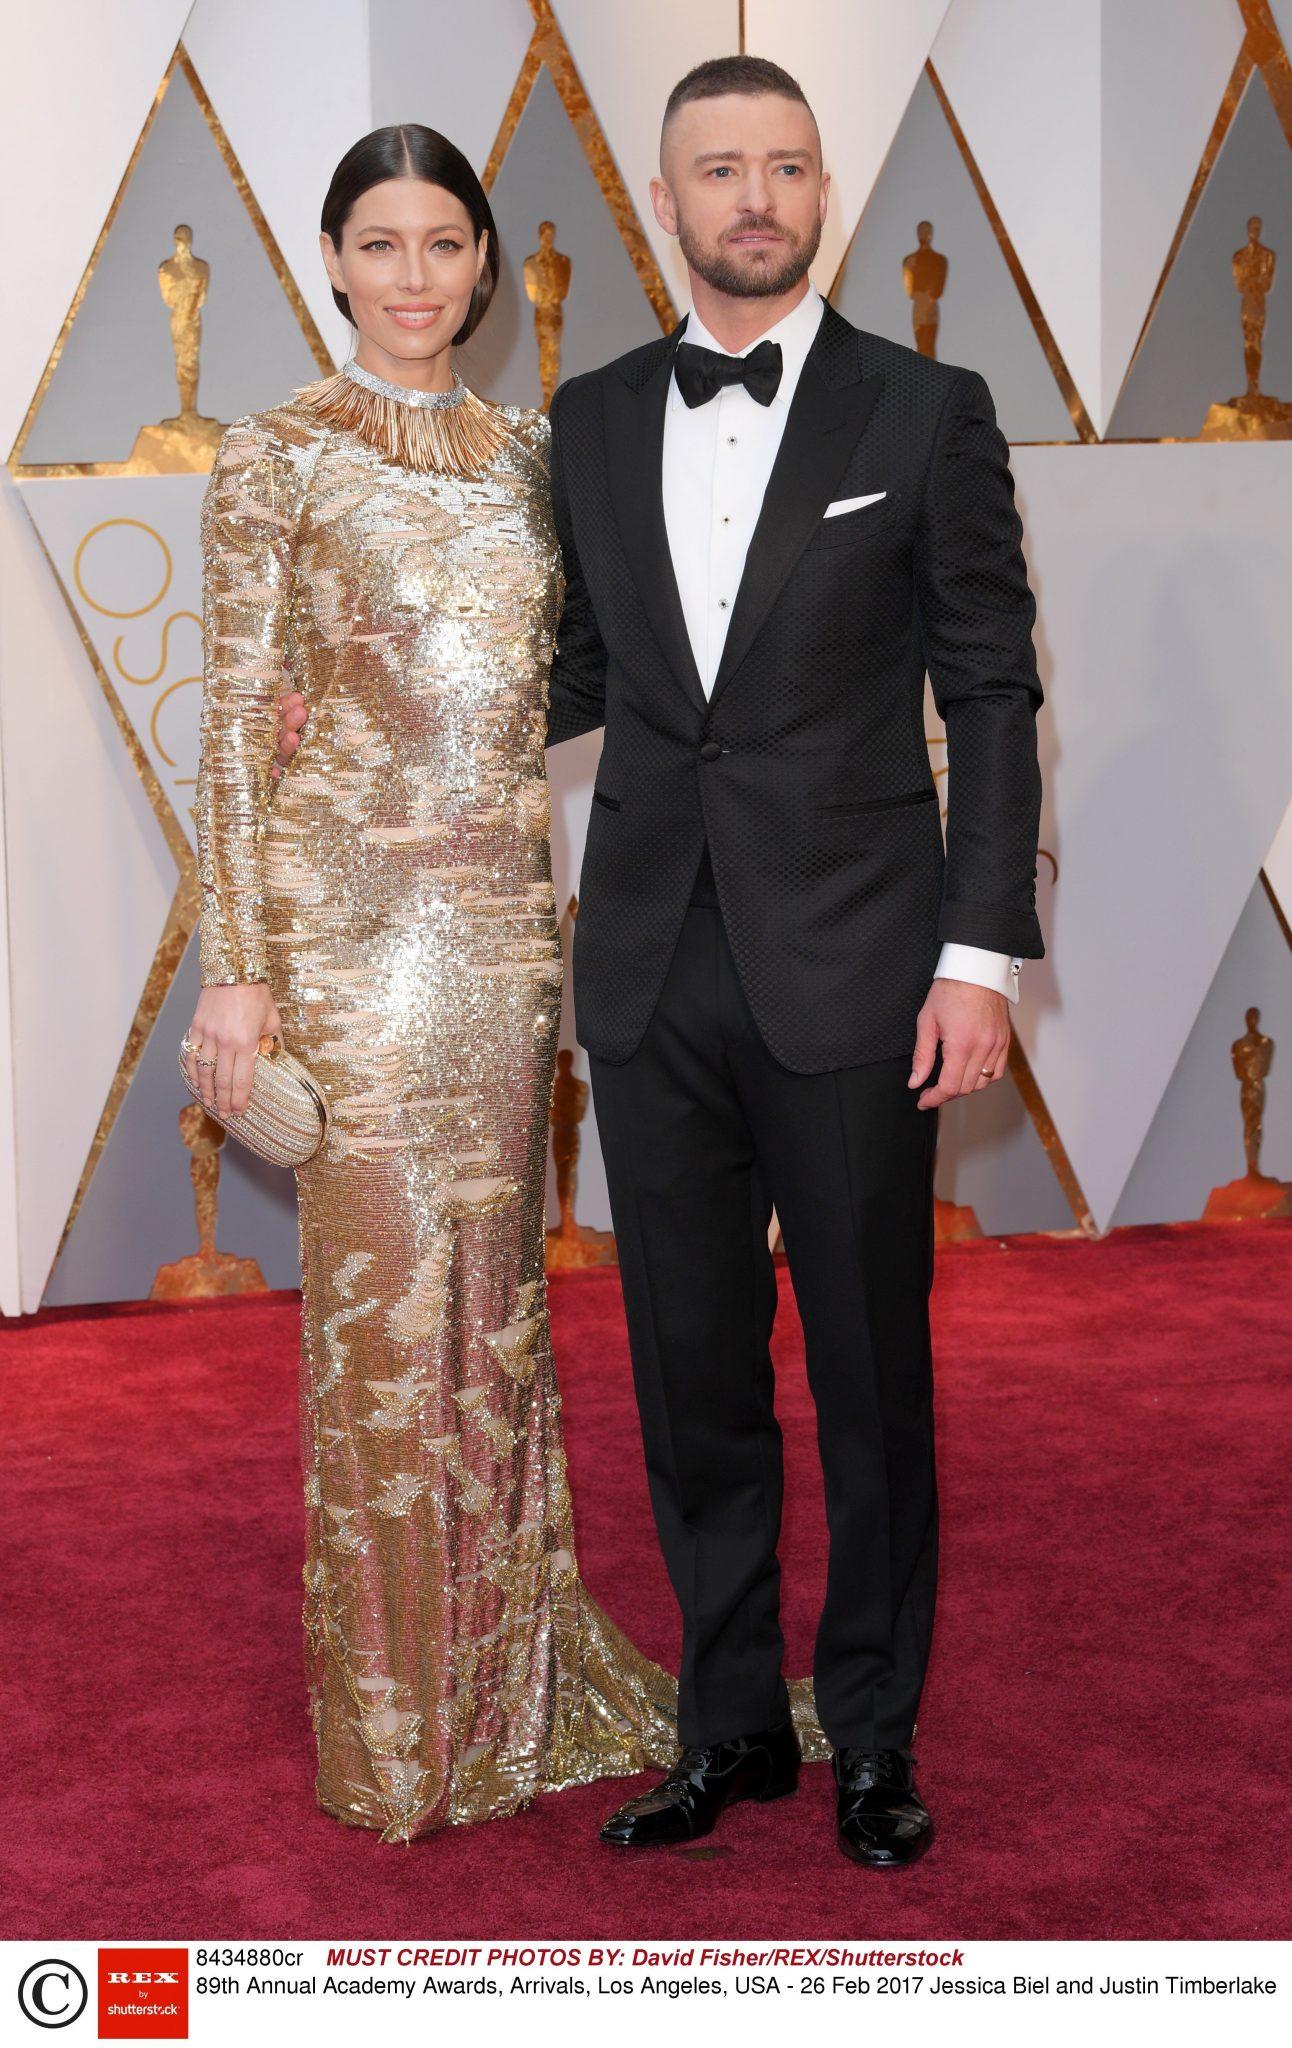 Jessica Biel (kreacja: Kaufman Franco) i Justin Timberlake - Oscary 2017